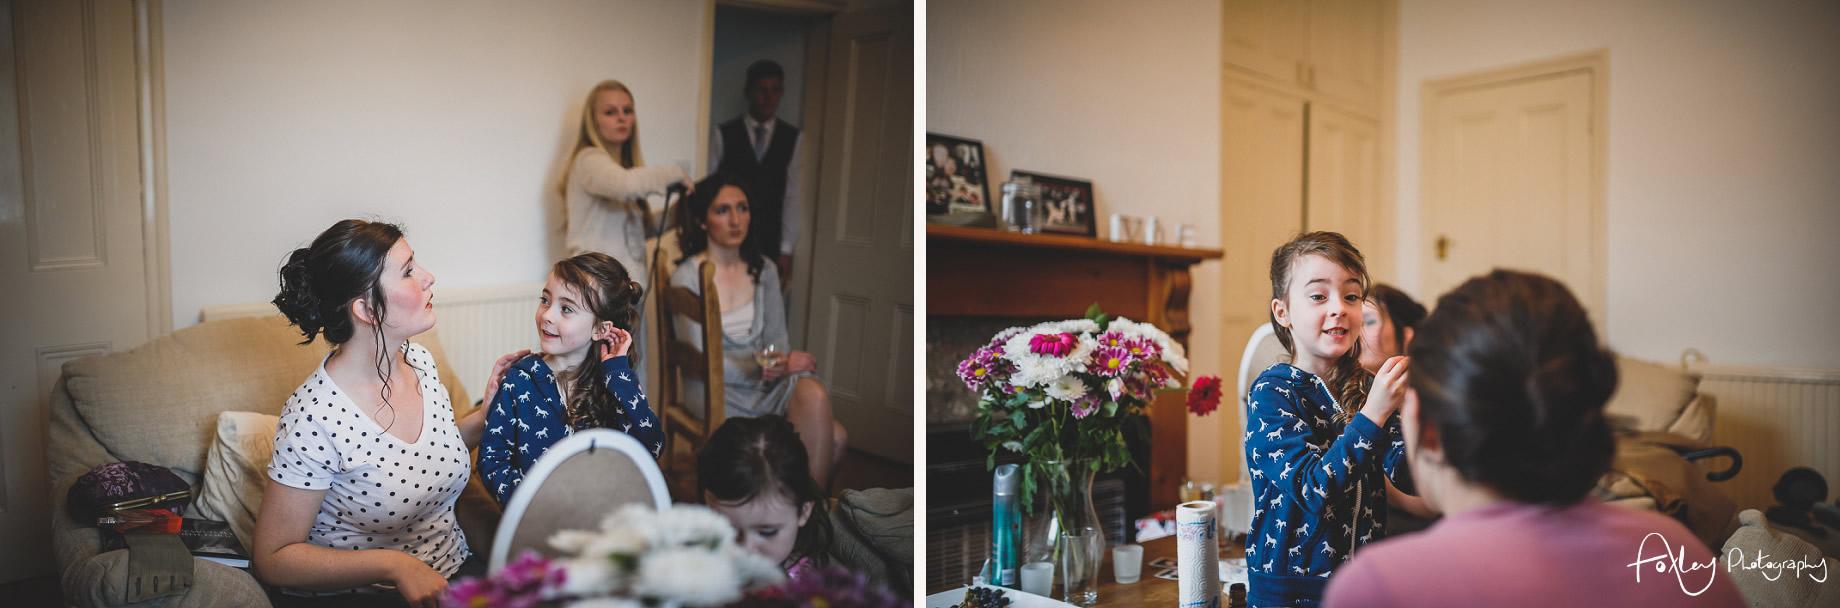 Mel-and-Lewis-Wedding-at-Barley-Village-Hall-018